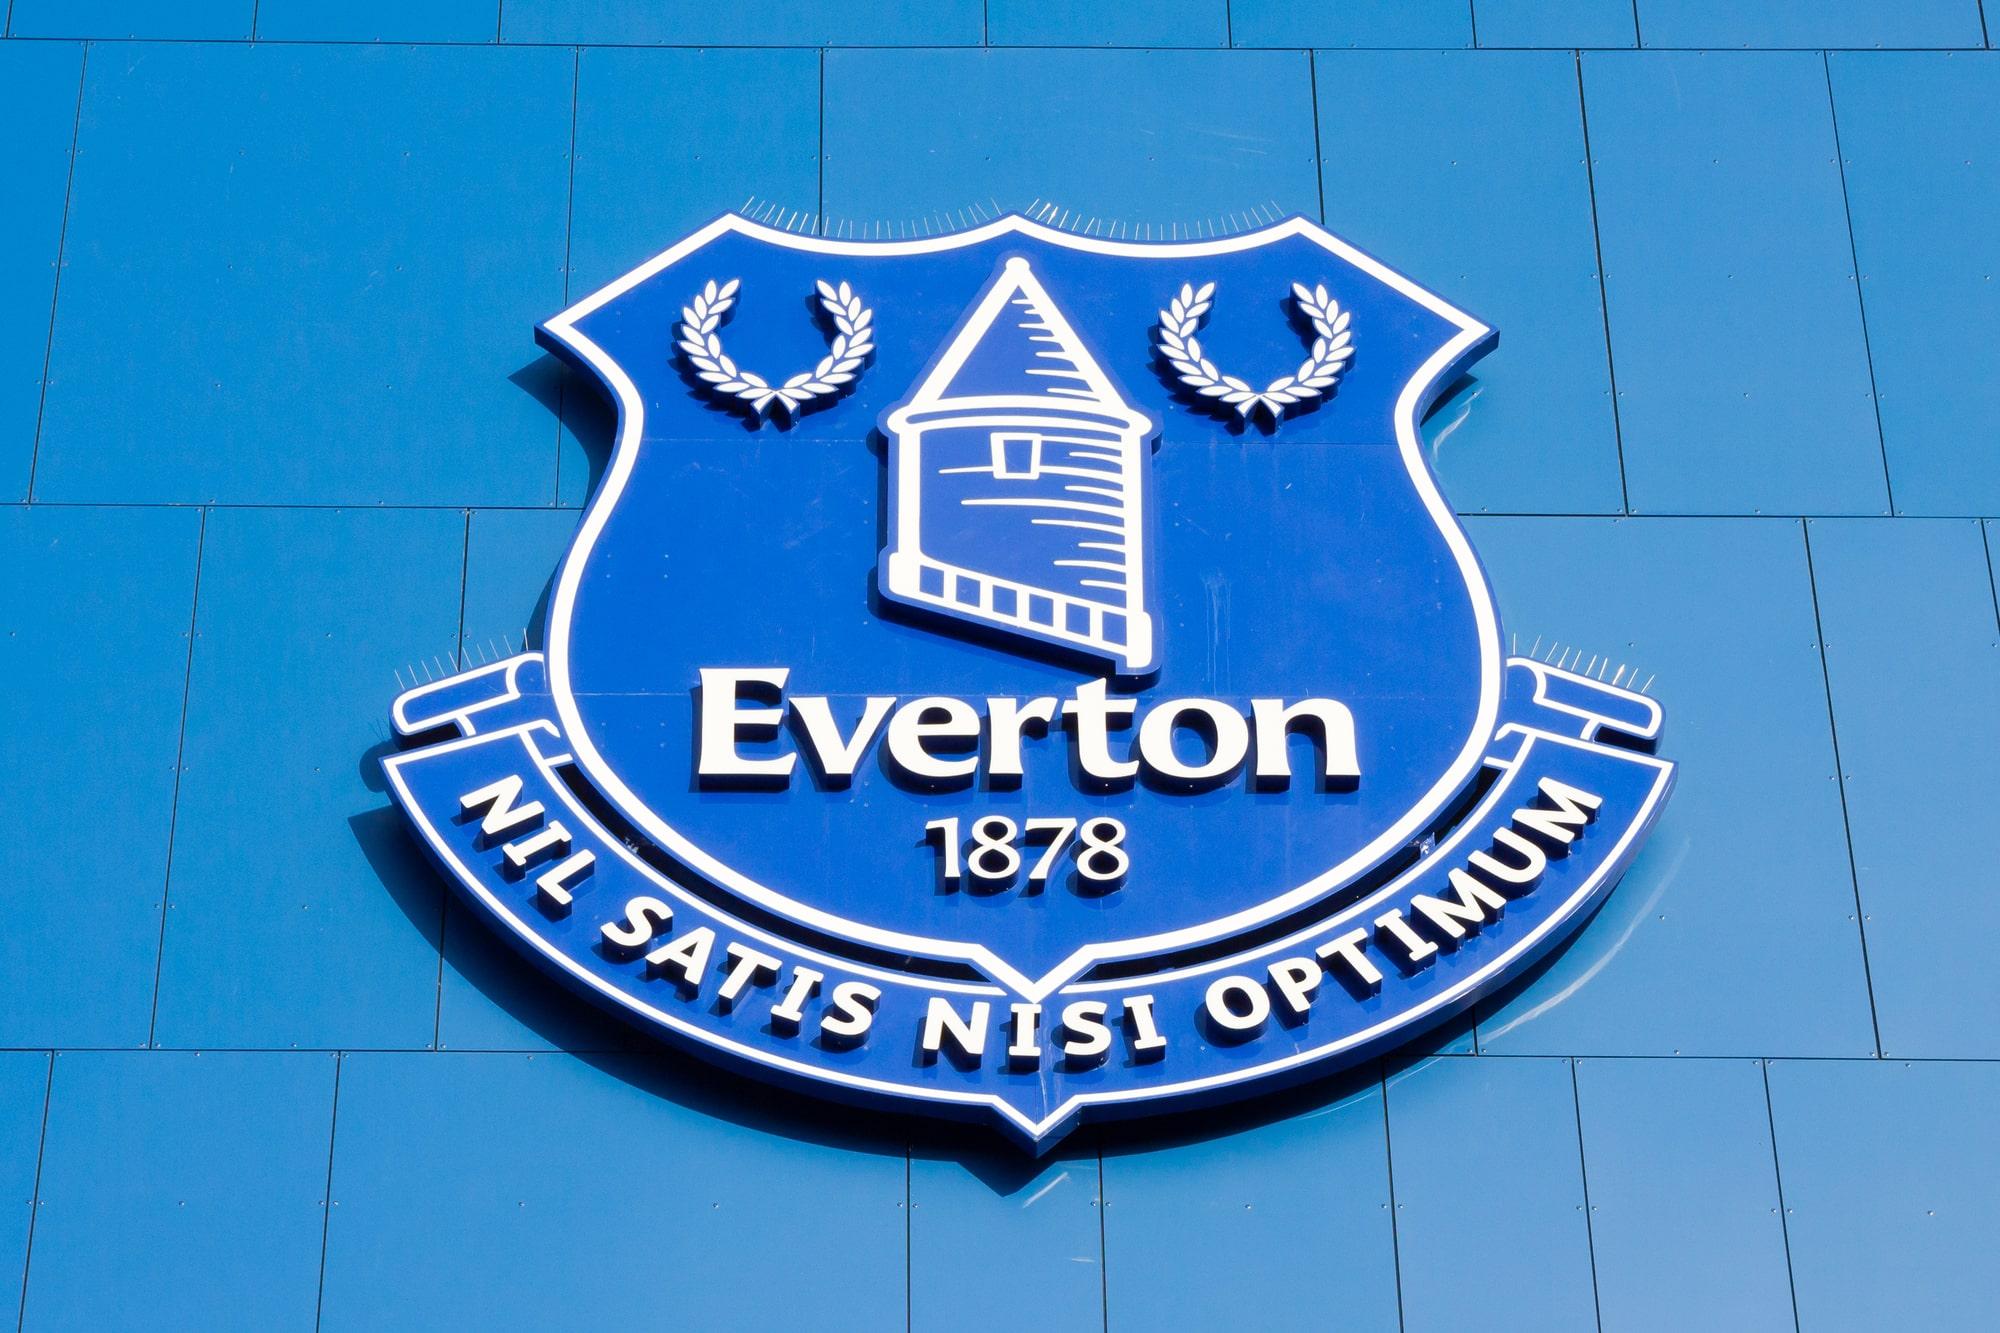 Everton Football Ground Goodison Park